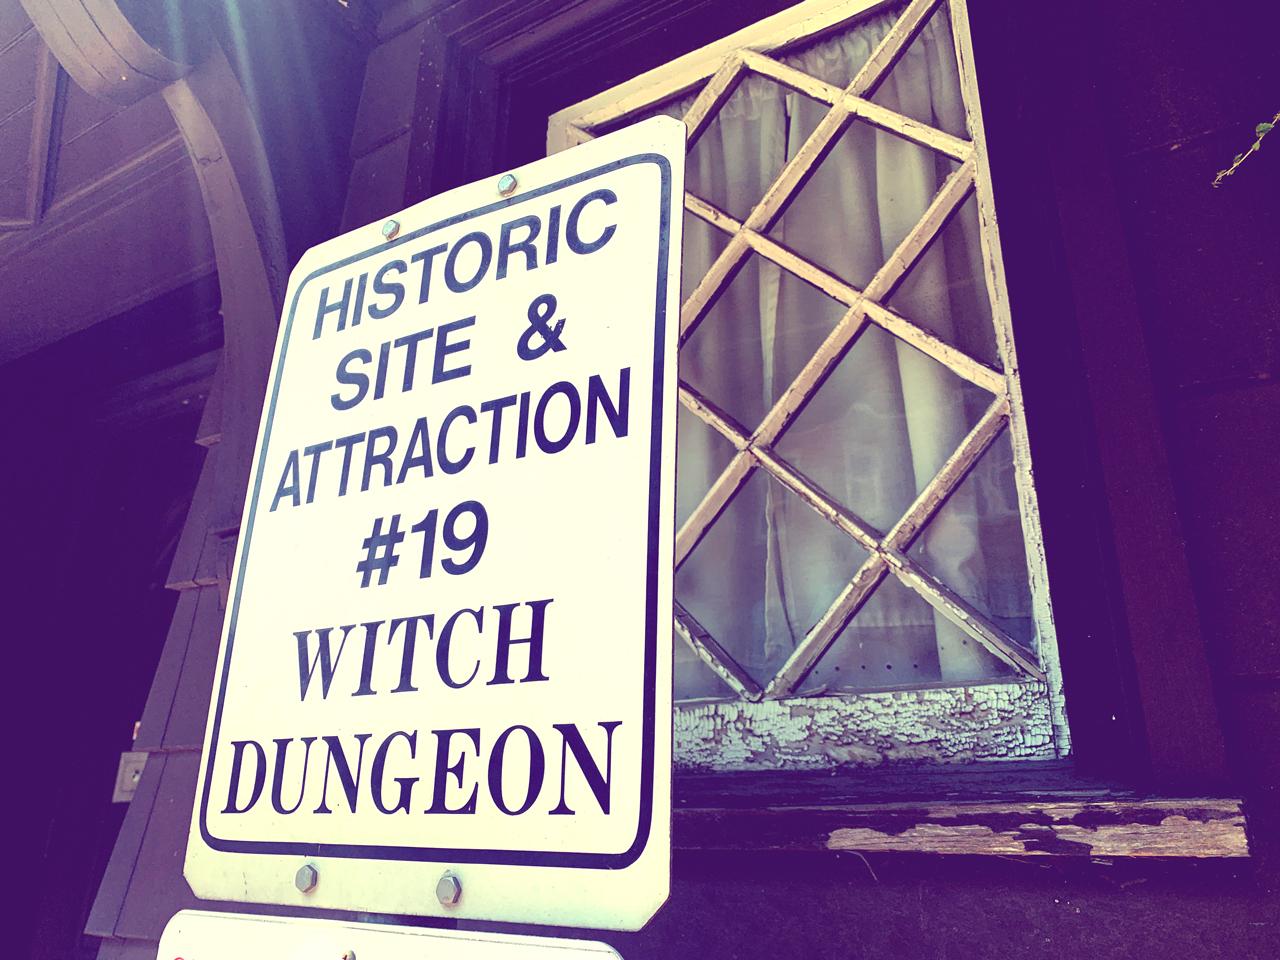 witch-dungeon-museum-salem-massachusetts-1280x960-02